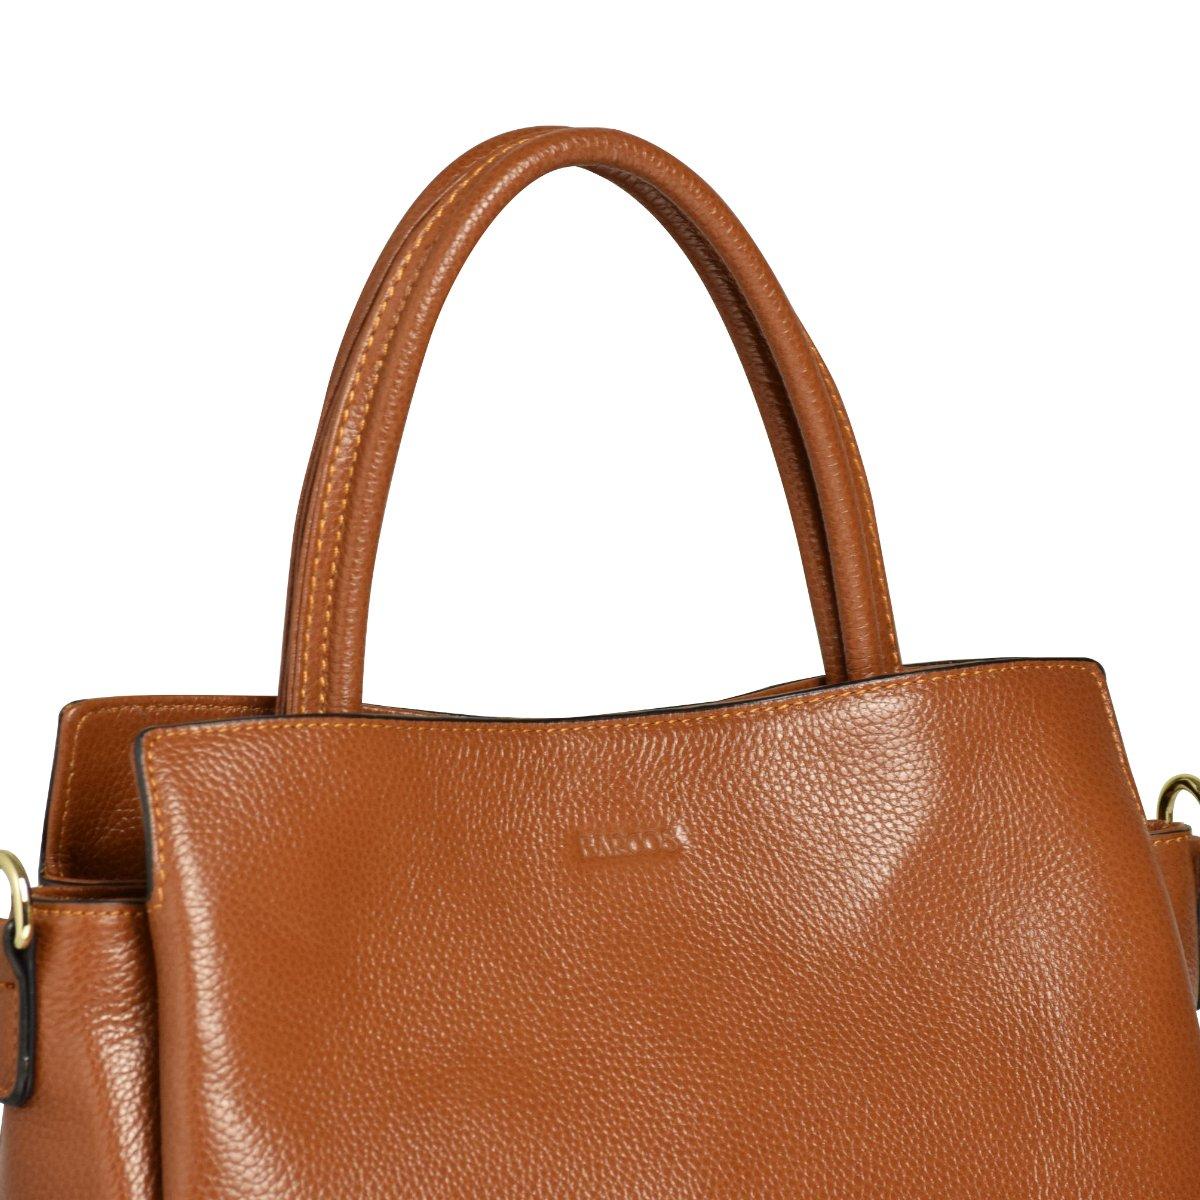 25da8107114c バルコスBARCOSハンドバッグショルダーバッグ2wayファスナー多収納ポケットシュリンクレザー本革バッグ鞄